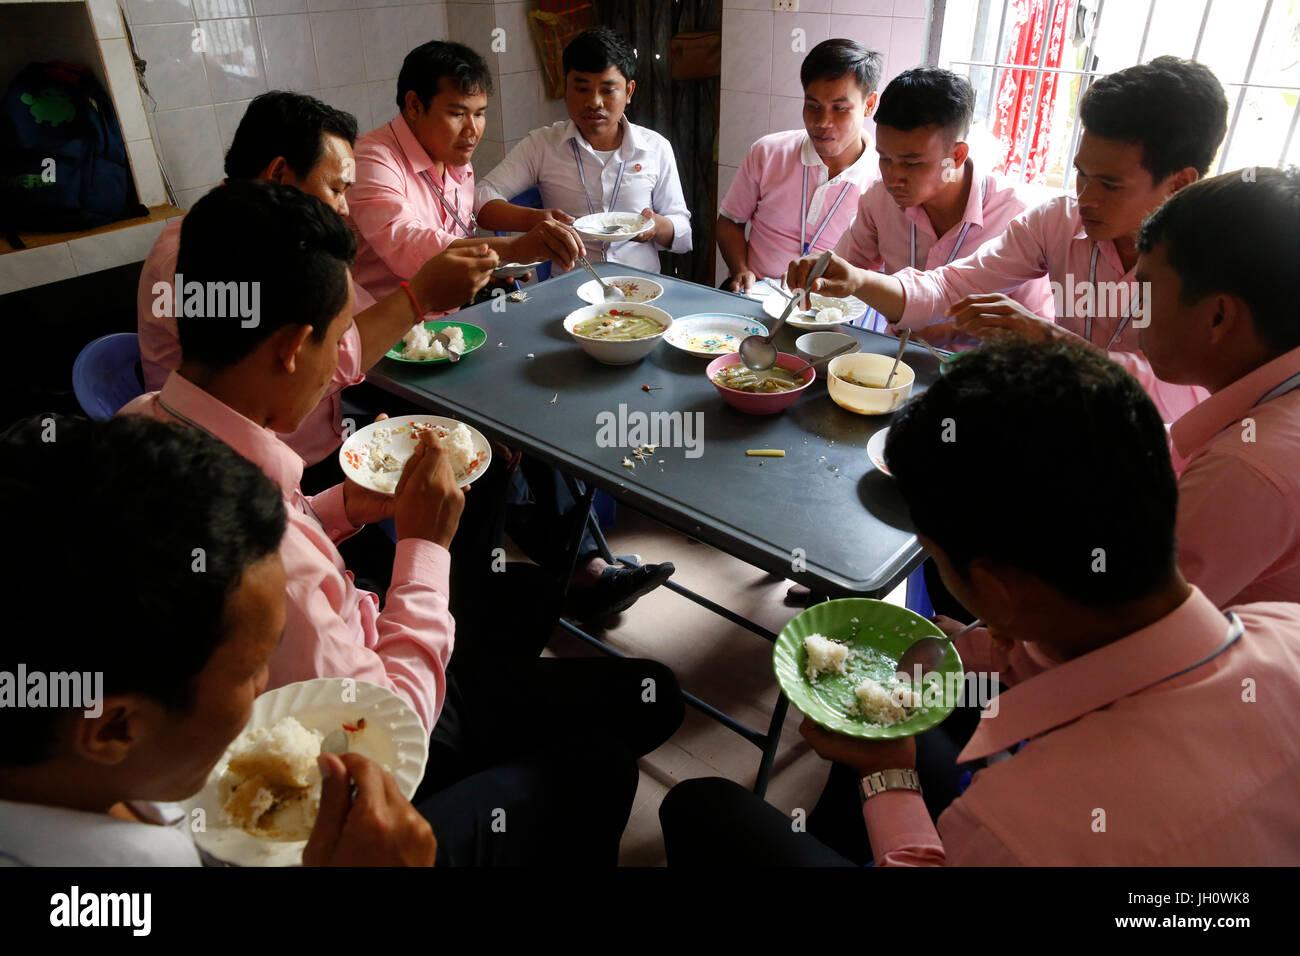 Chamroeun Microfinance Battambang Niederlassung. Mitarbeiter-Mittagessen. Kambodscha. Stockbild